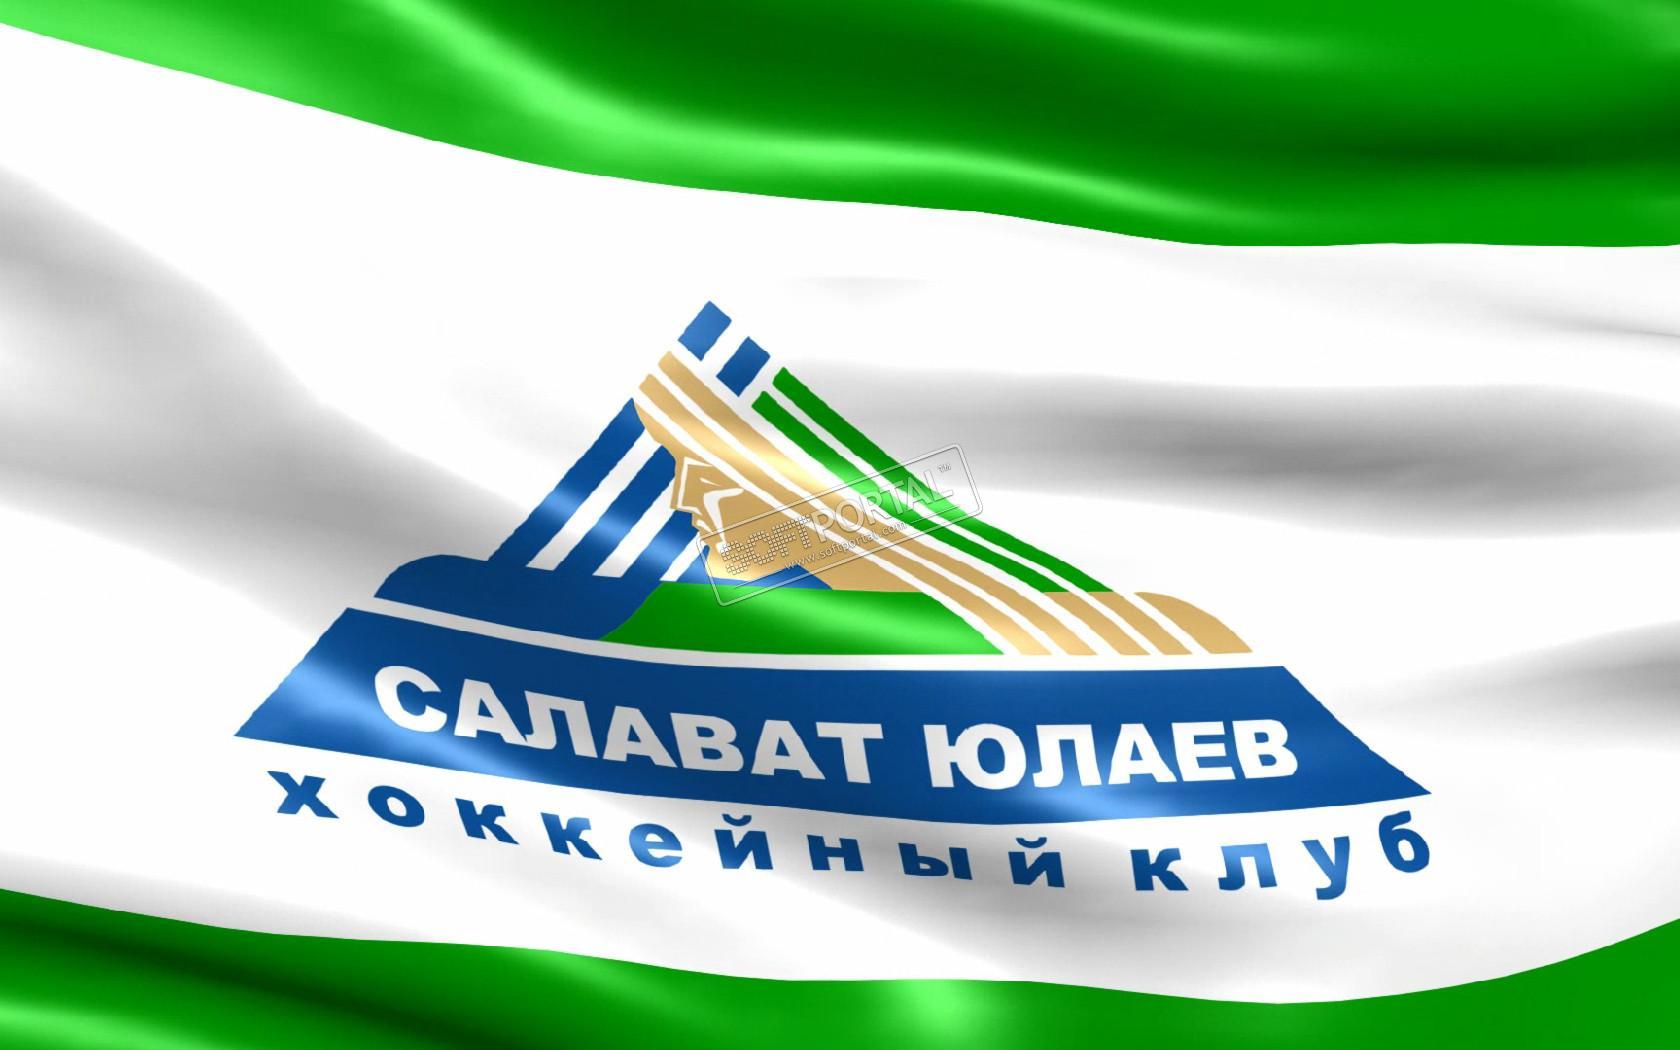 Салават Юлаев— Лада. Прогноз нахоккей 08.11.2016